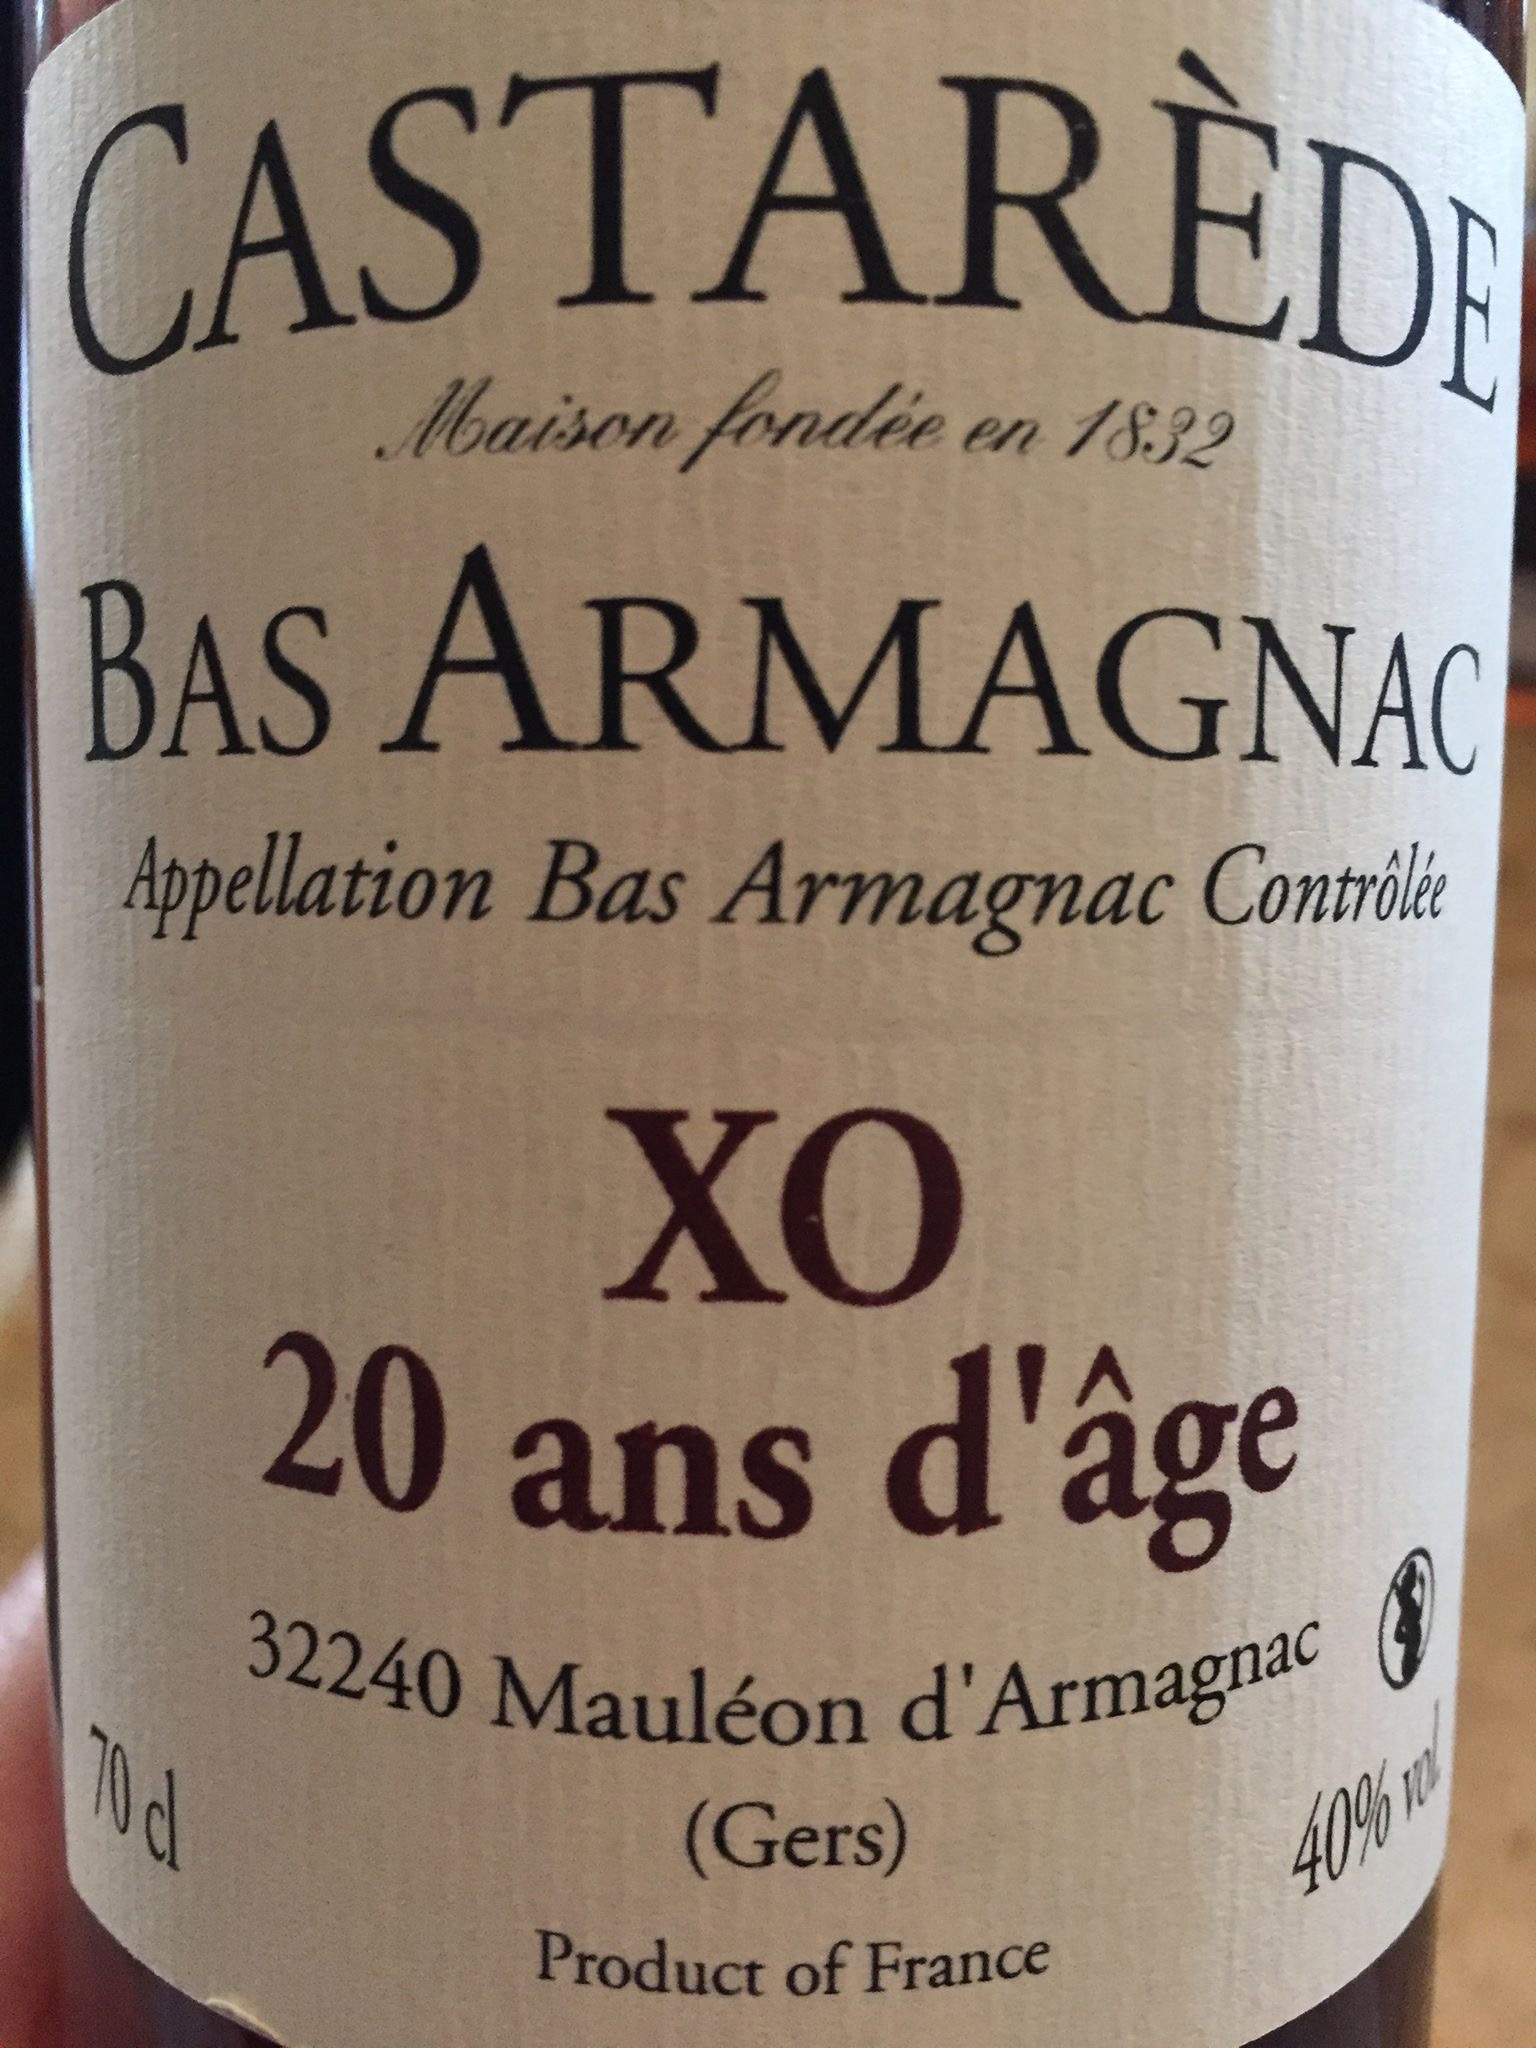 Castarède – XO 20 ans d'âge – Bas-Armagnac